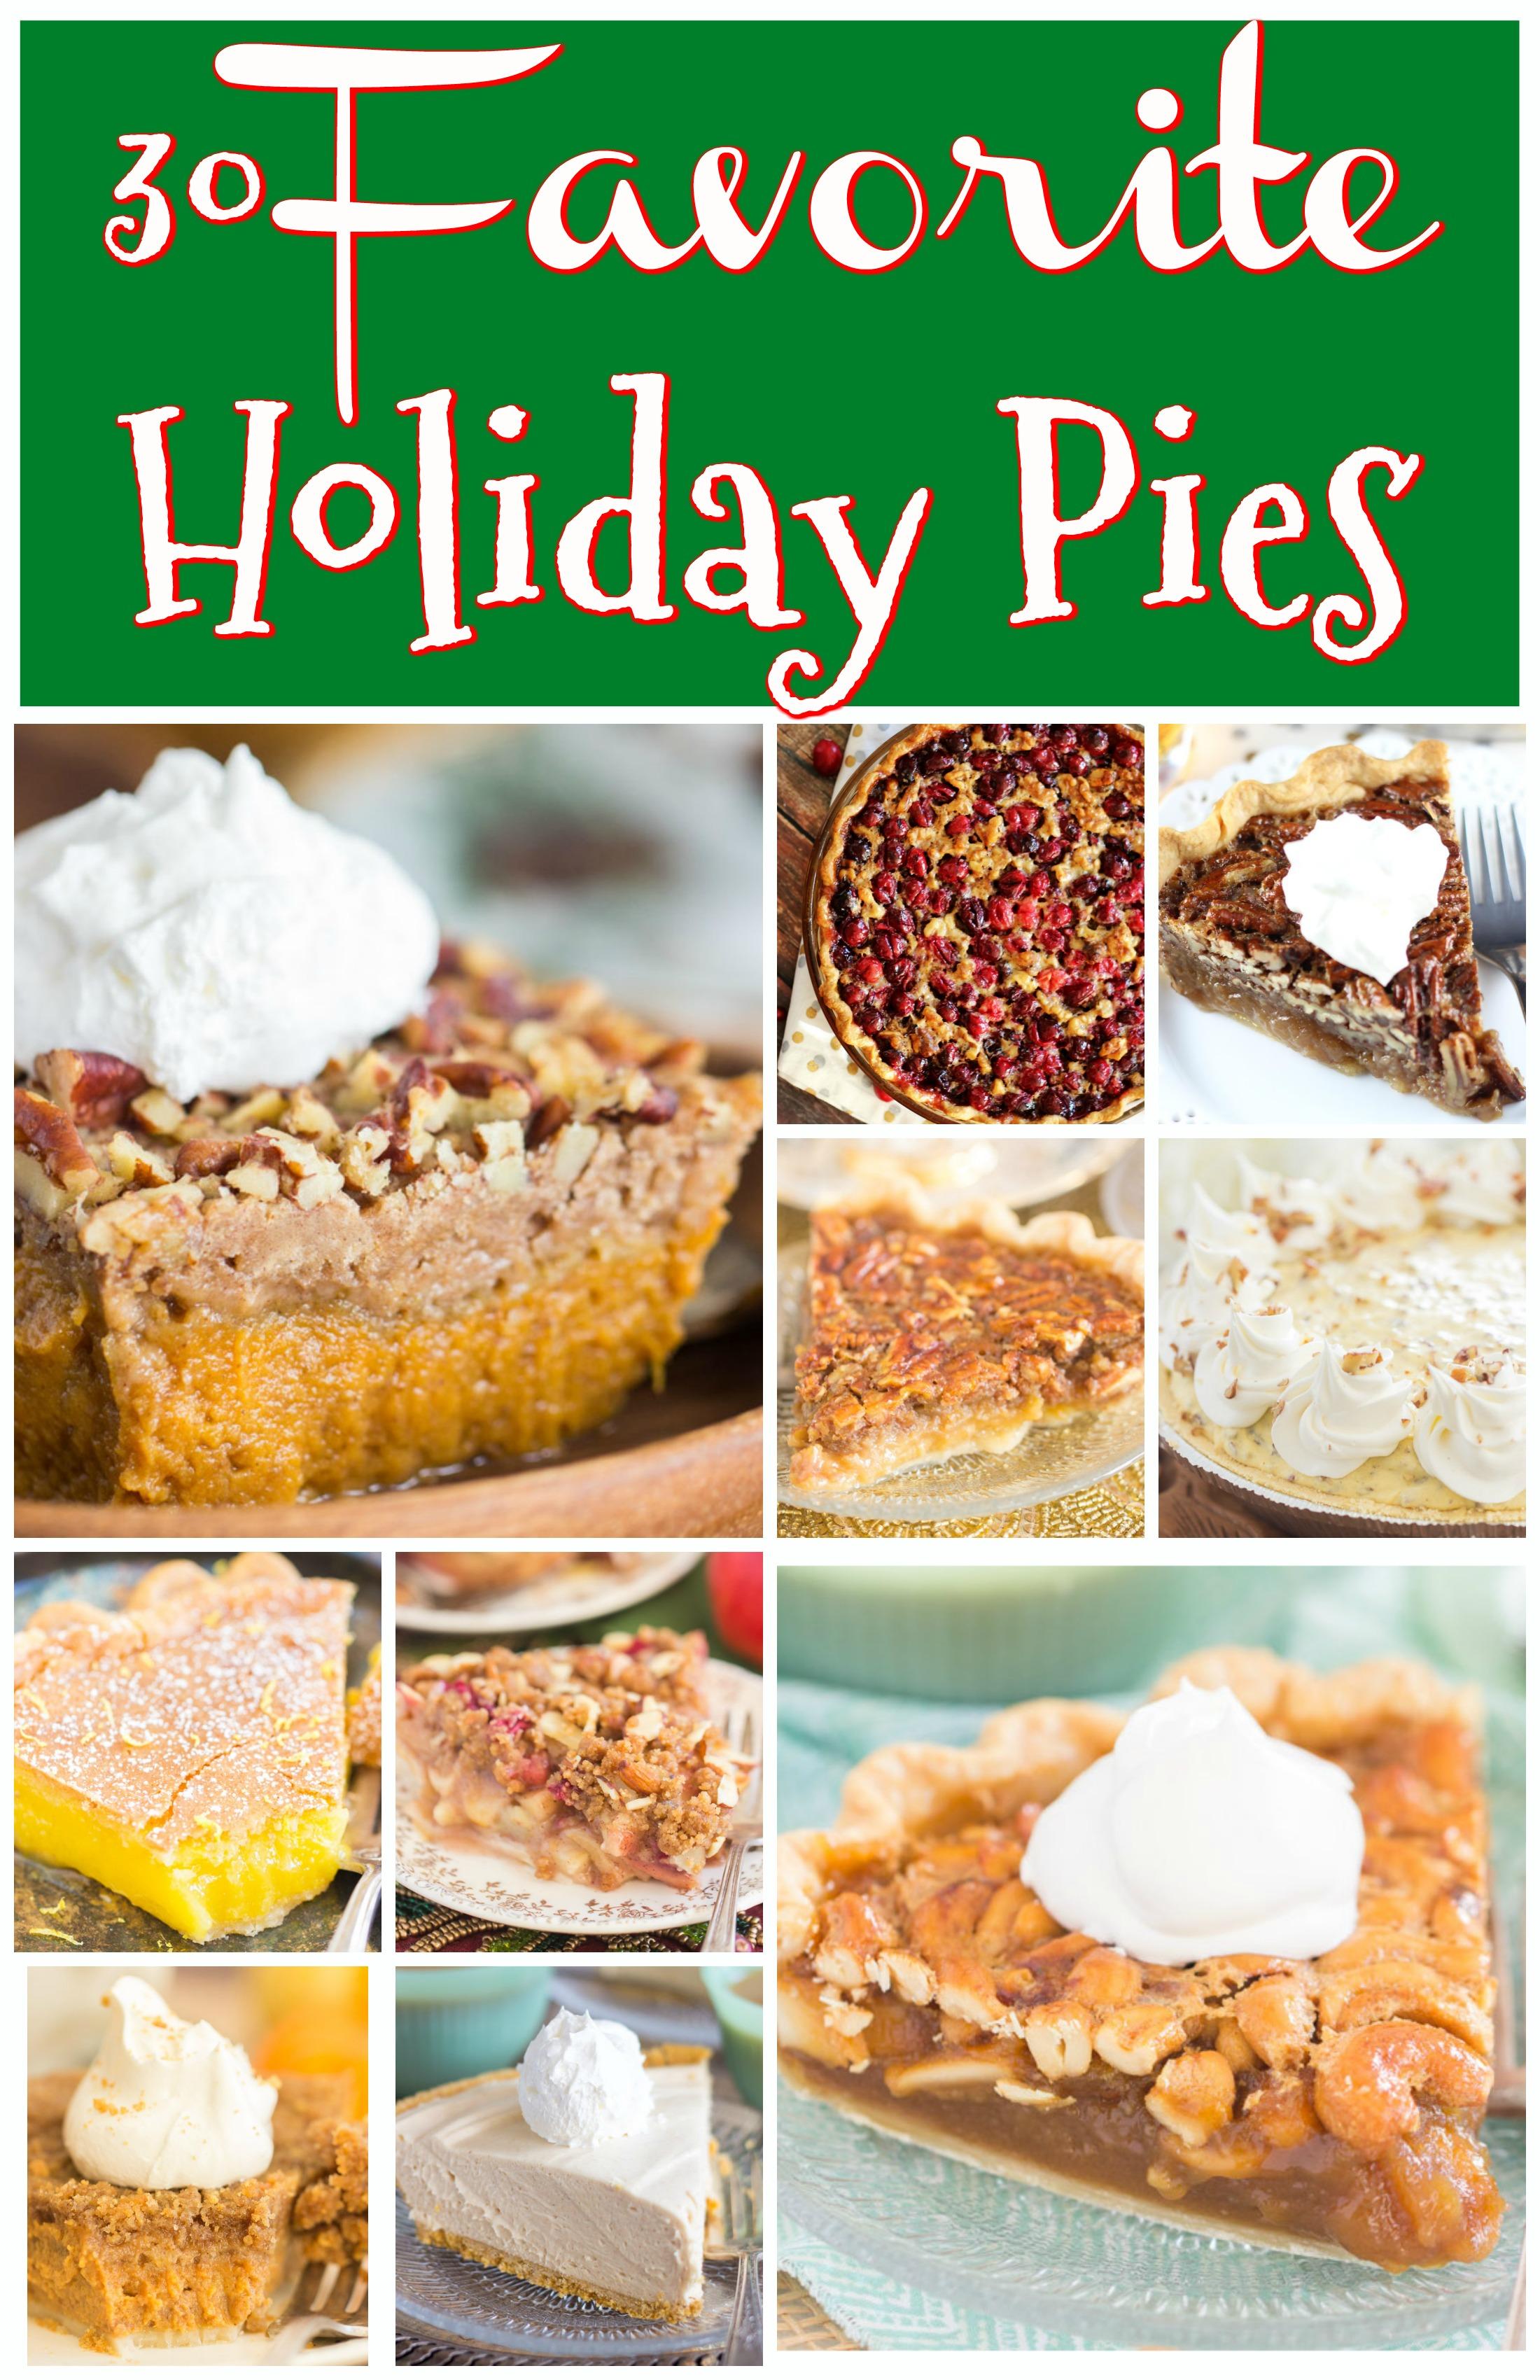 Christmas Pies.30 Best Christmas Pie Recipes To Make This Season